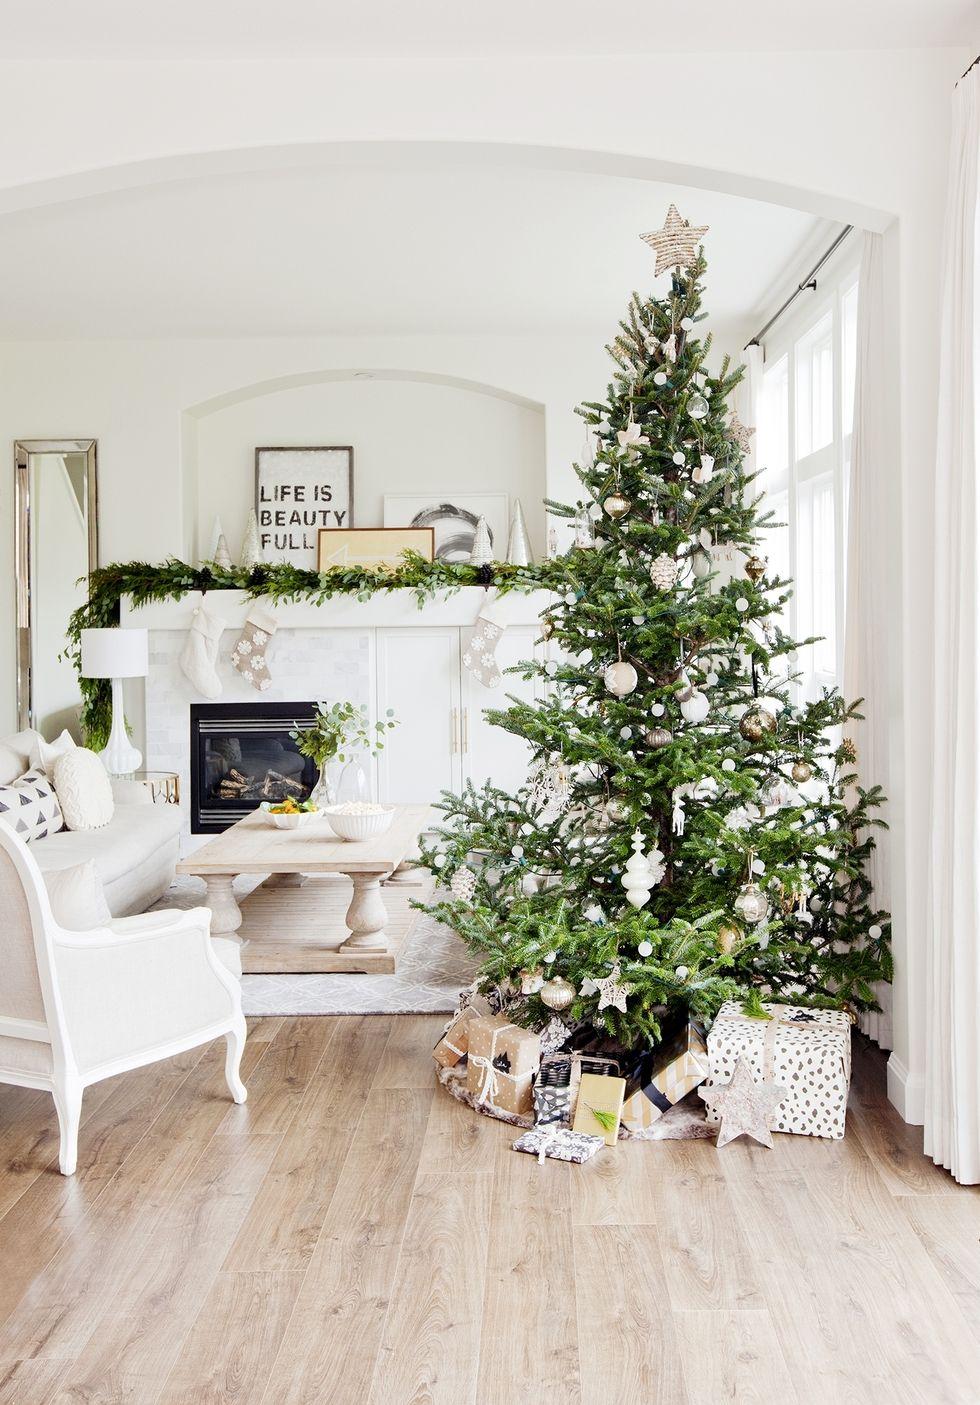 Christmas-Decor-Trends-2017-3.jpg